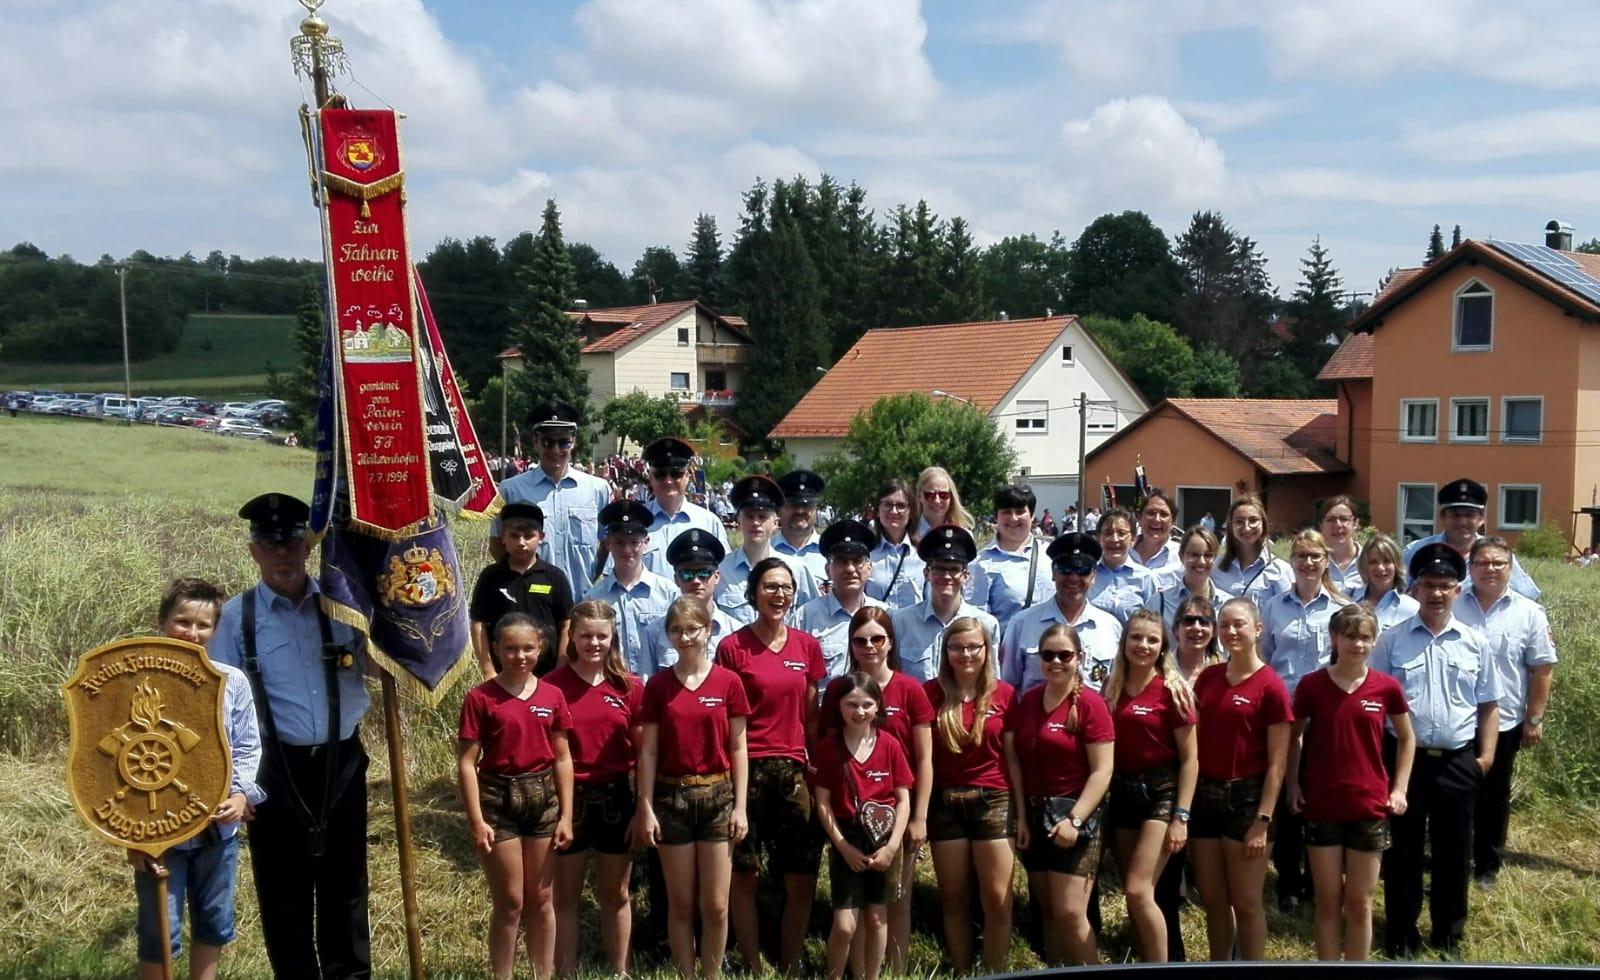 2019-06-23 Festzug 125 Jahre FF Bergstetten